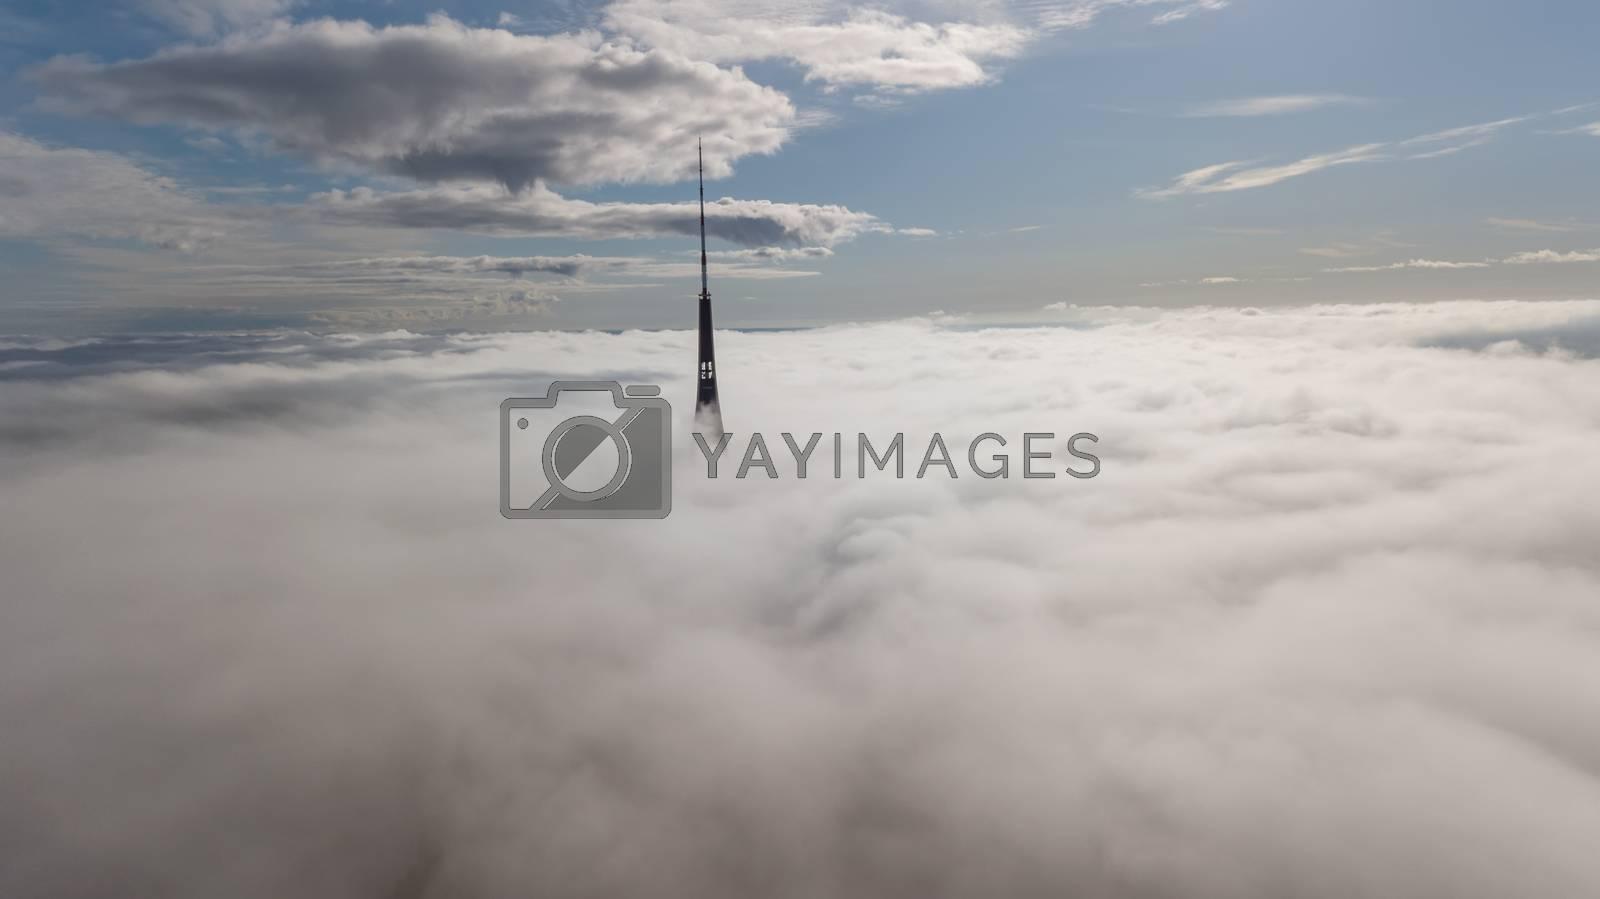 Riga Latvia Tv Tower Zakusala smoke clouds Europe biggest Aerial drone top view